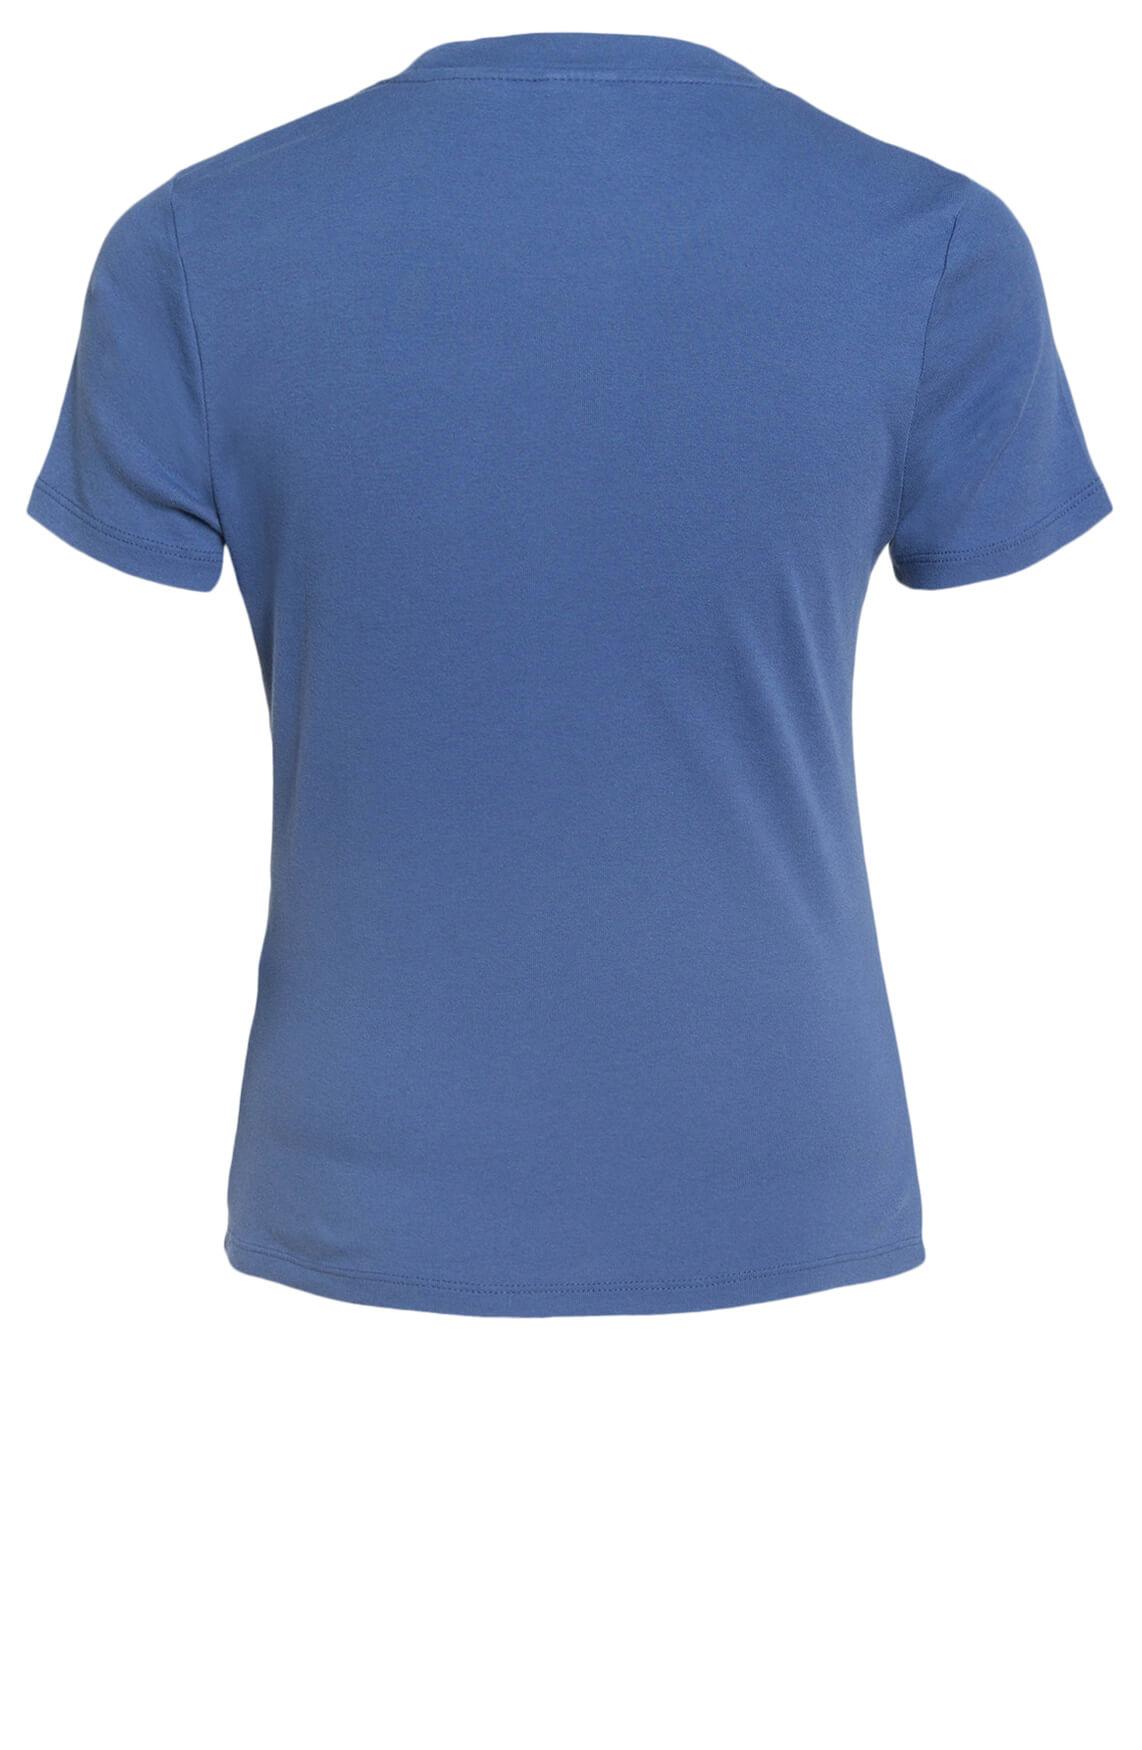 Levi s Dames T-shirt Blauw